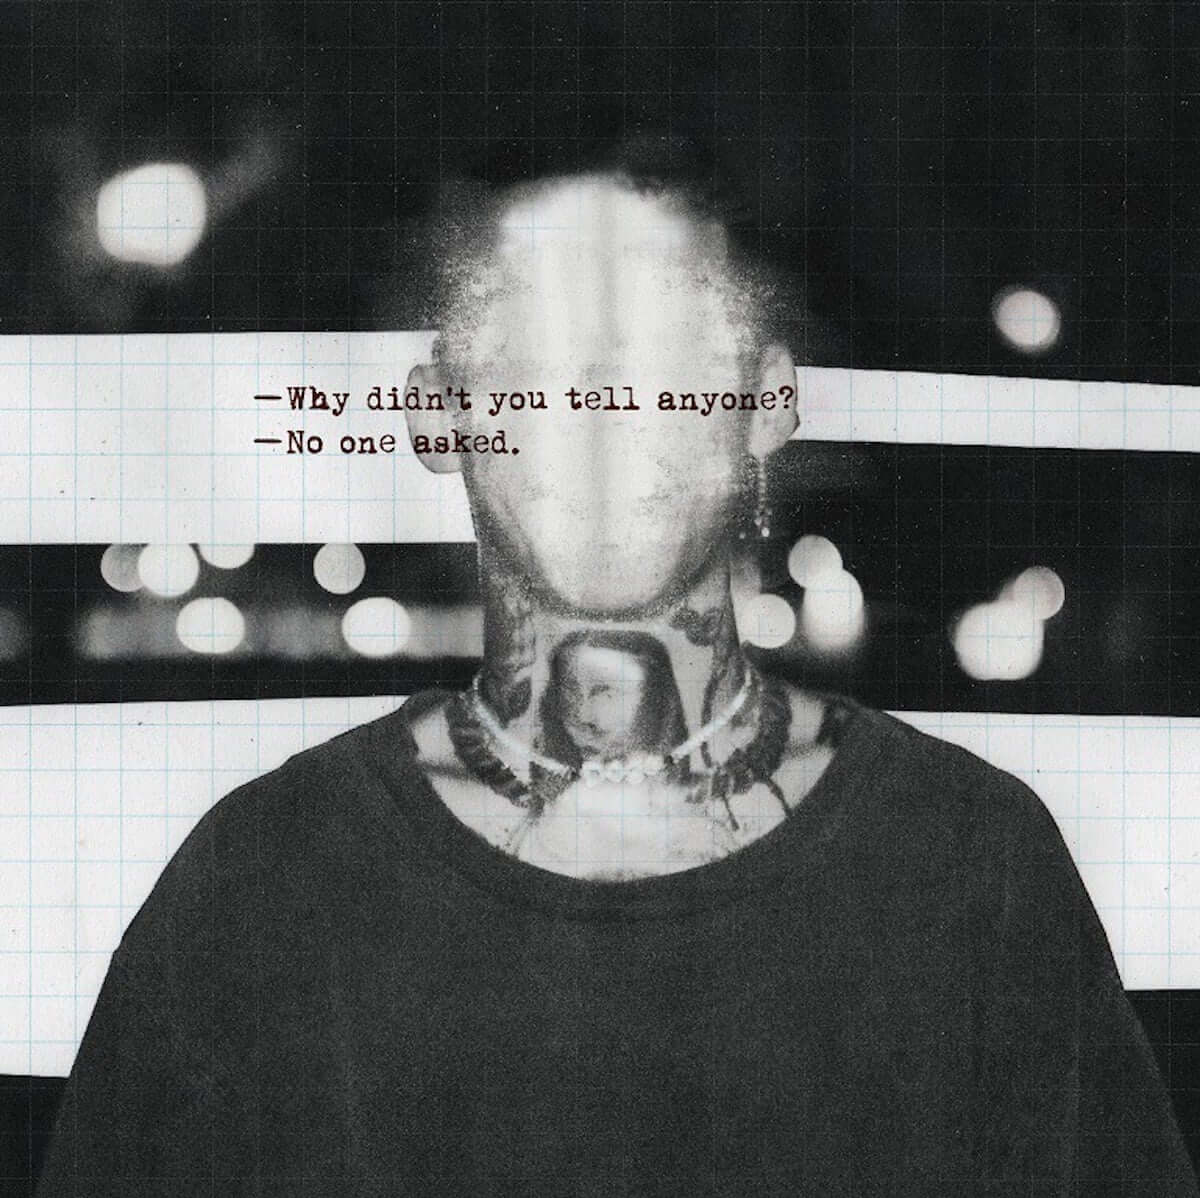 KOHH、ワンオクTakaとコラボした「I Want a Billion」の360°全方位MVフルバージョン公開! music190410_kohh_1-1200x1198